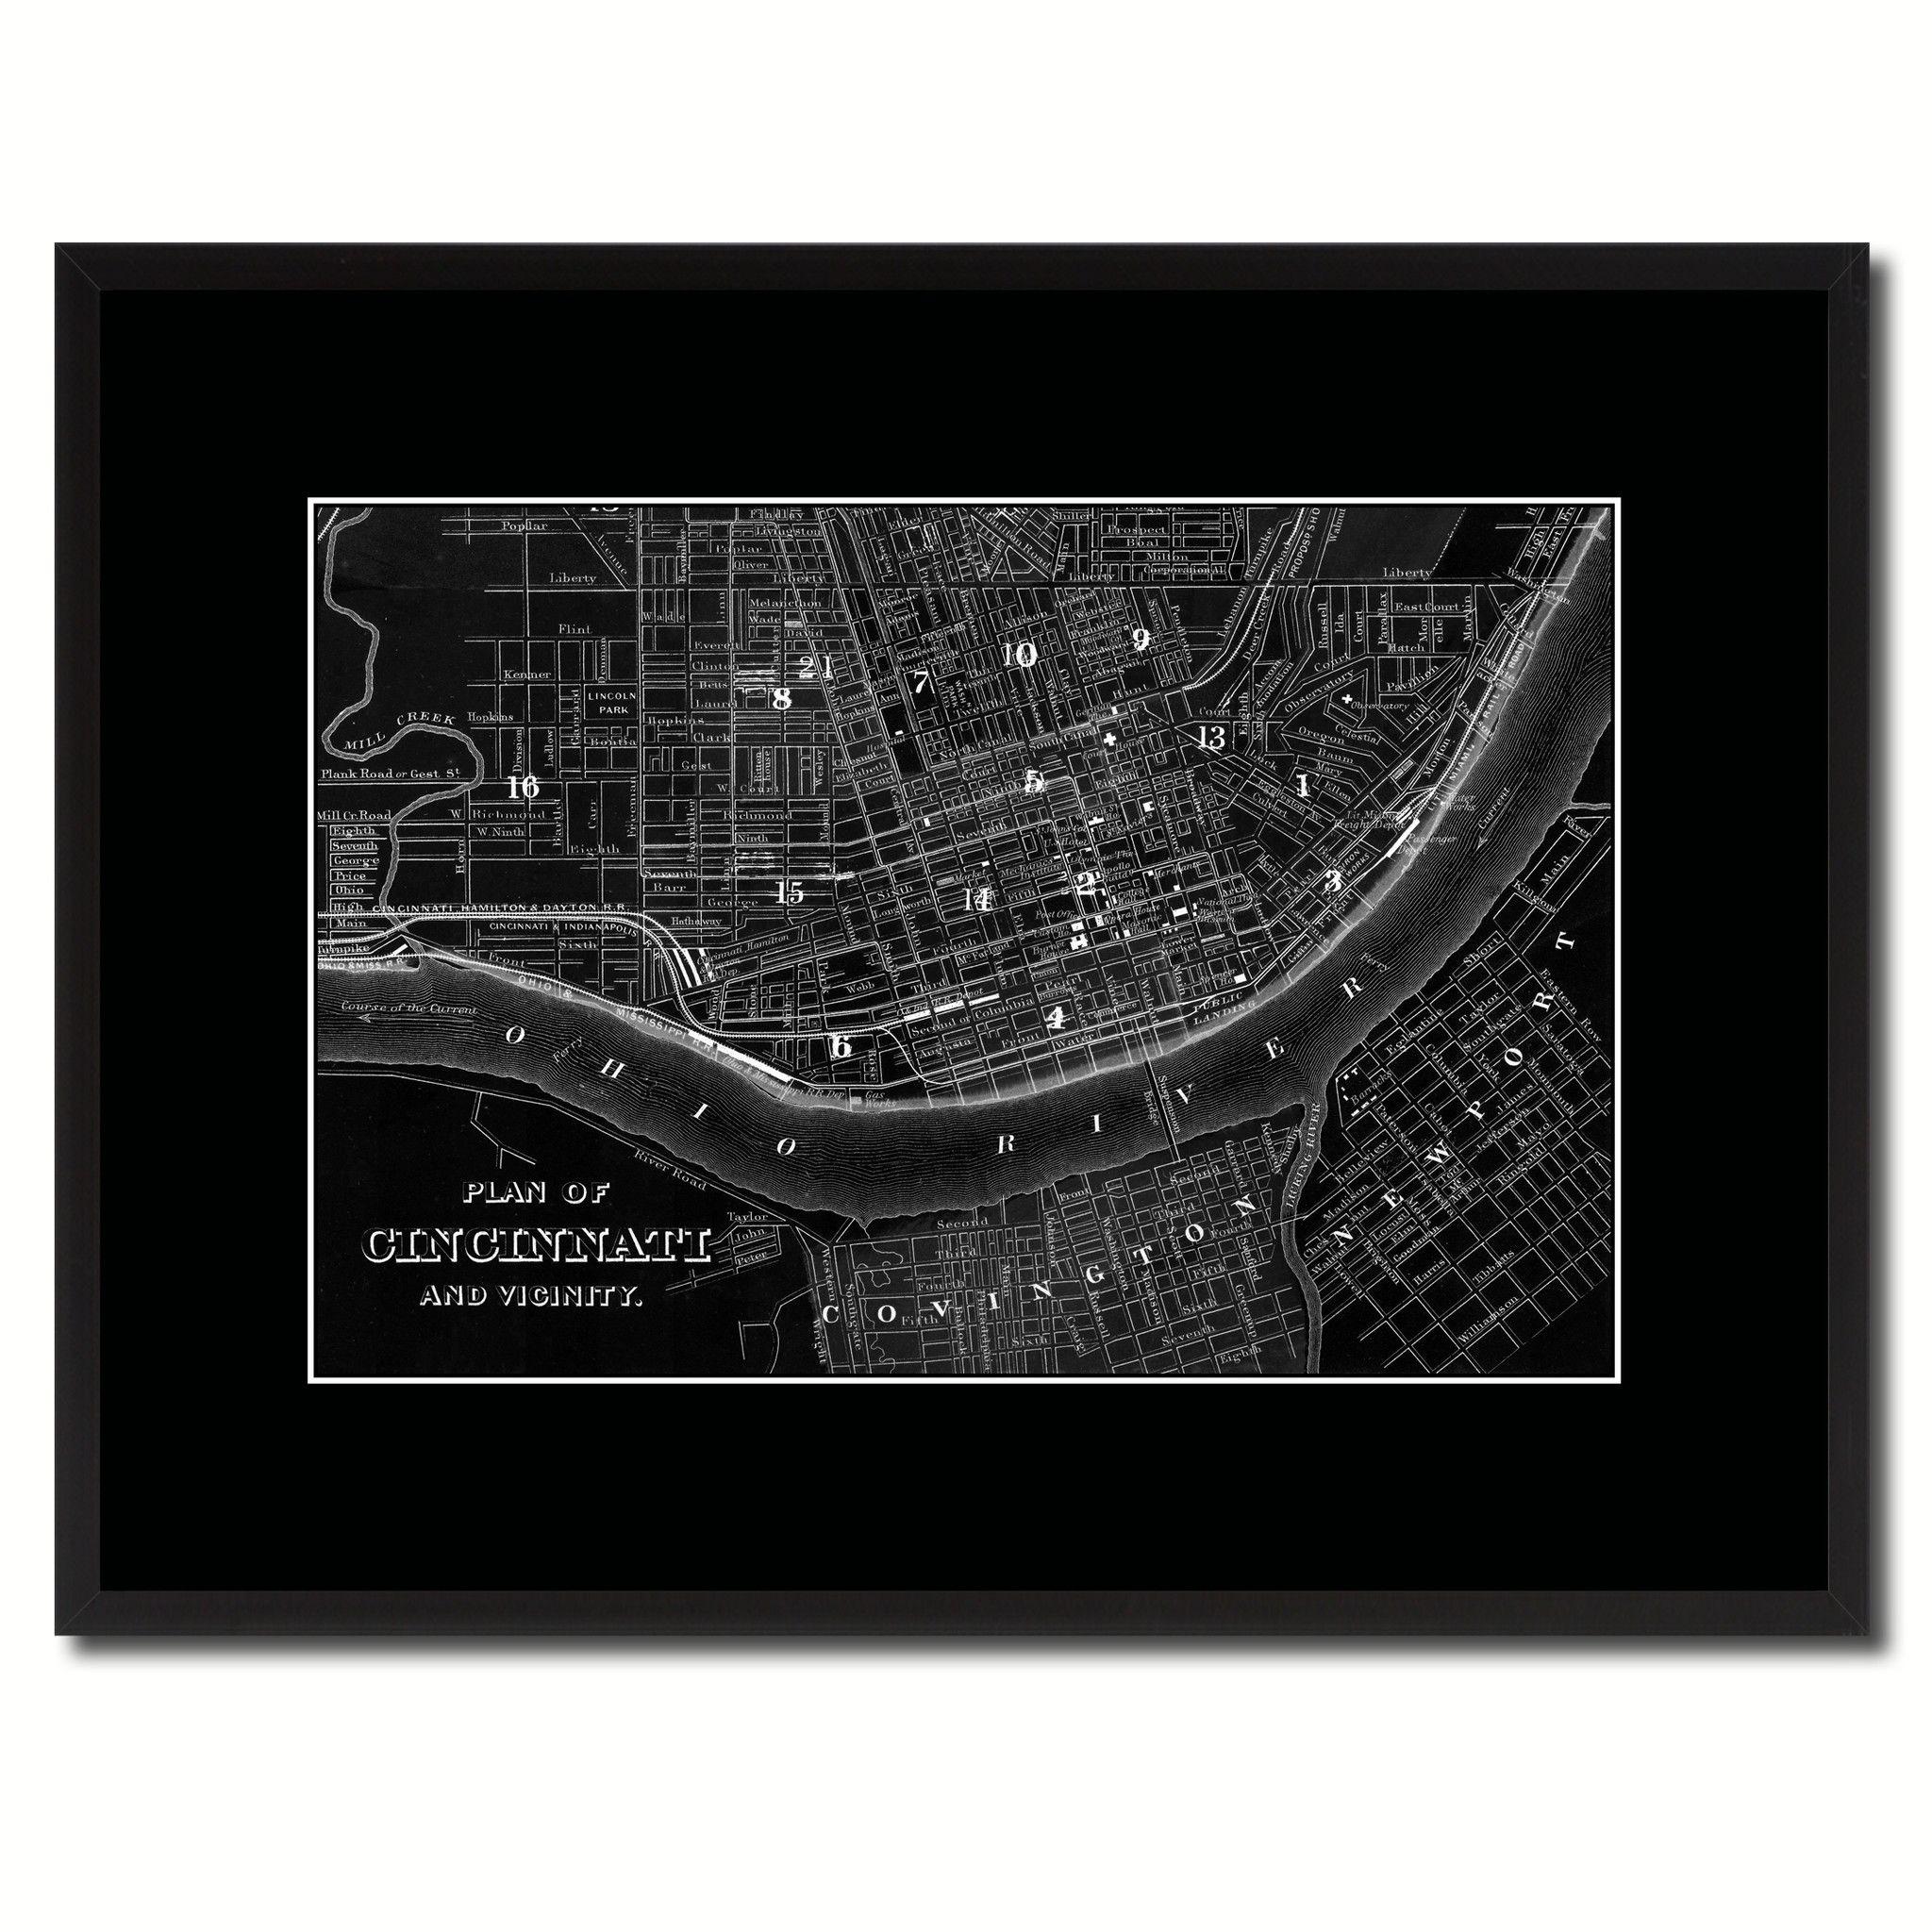 Cincinnati Vintage Monochrome Map Canvas Print, Gifts Picture Frames Home  Decor Wall Art